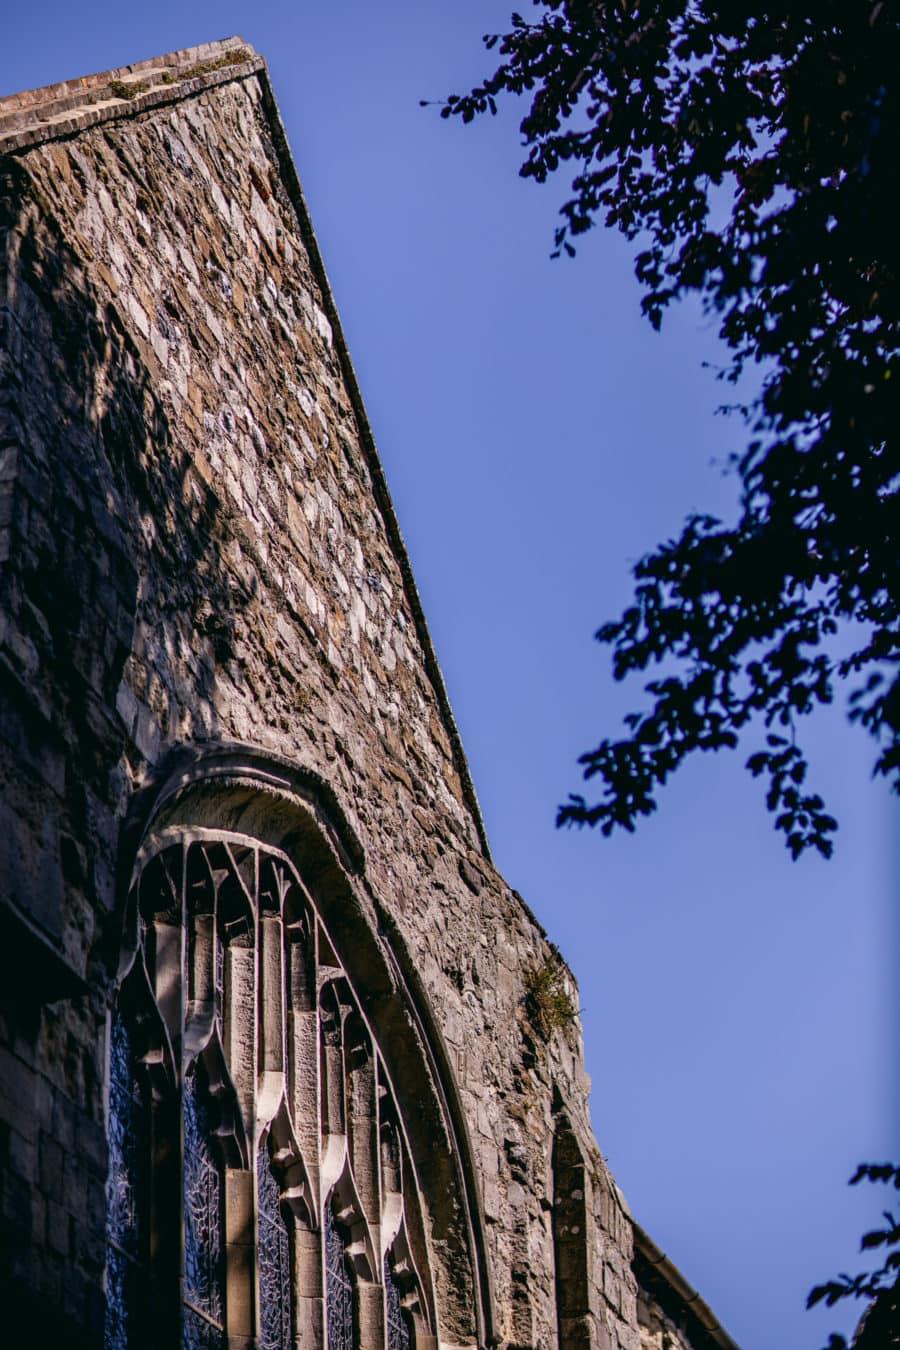 St Marys Church in Rye